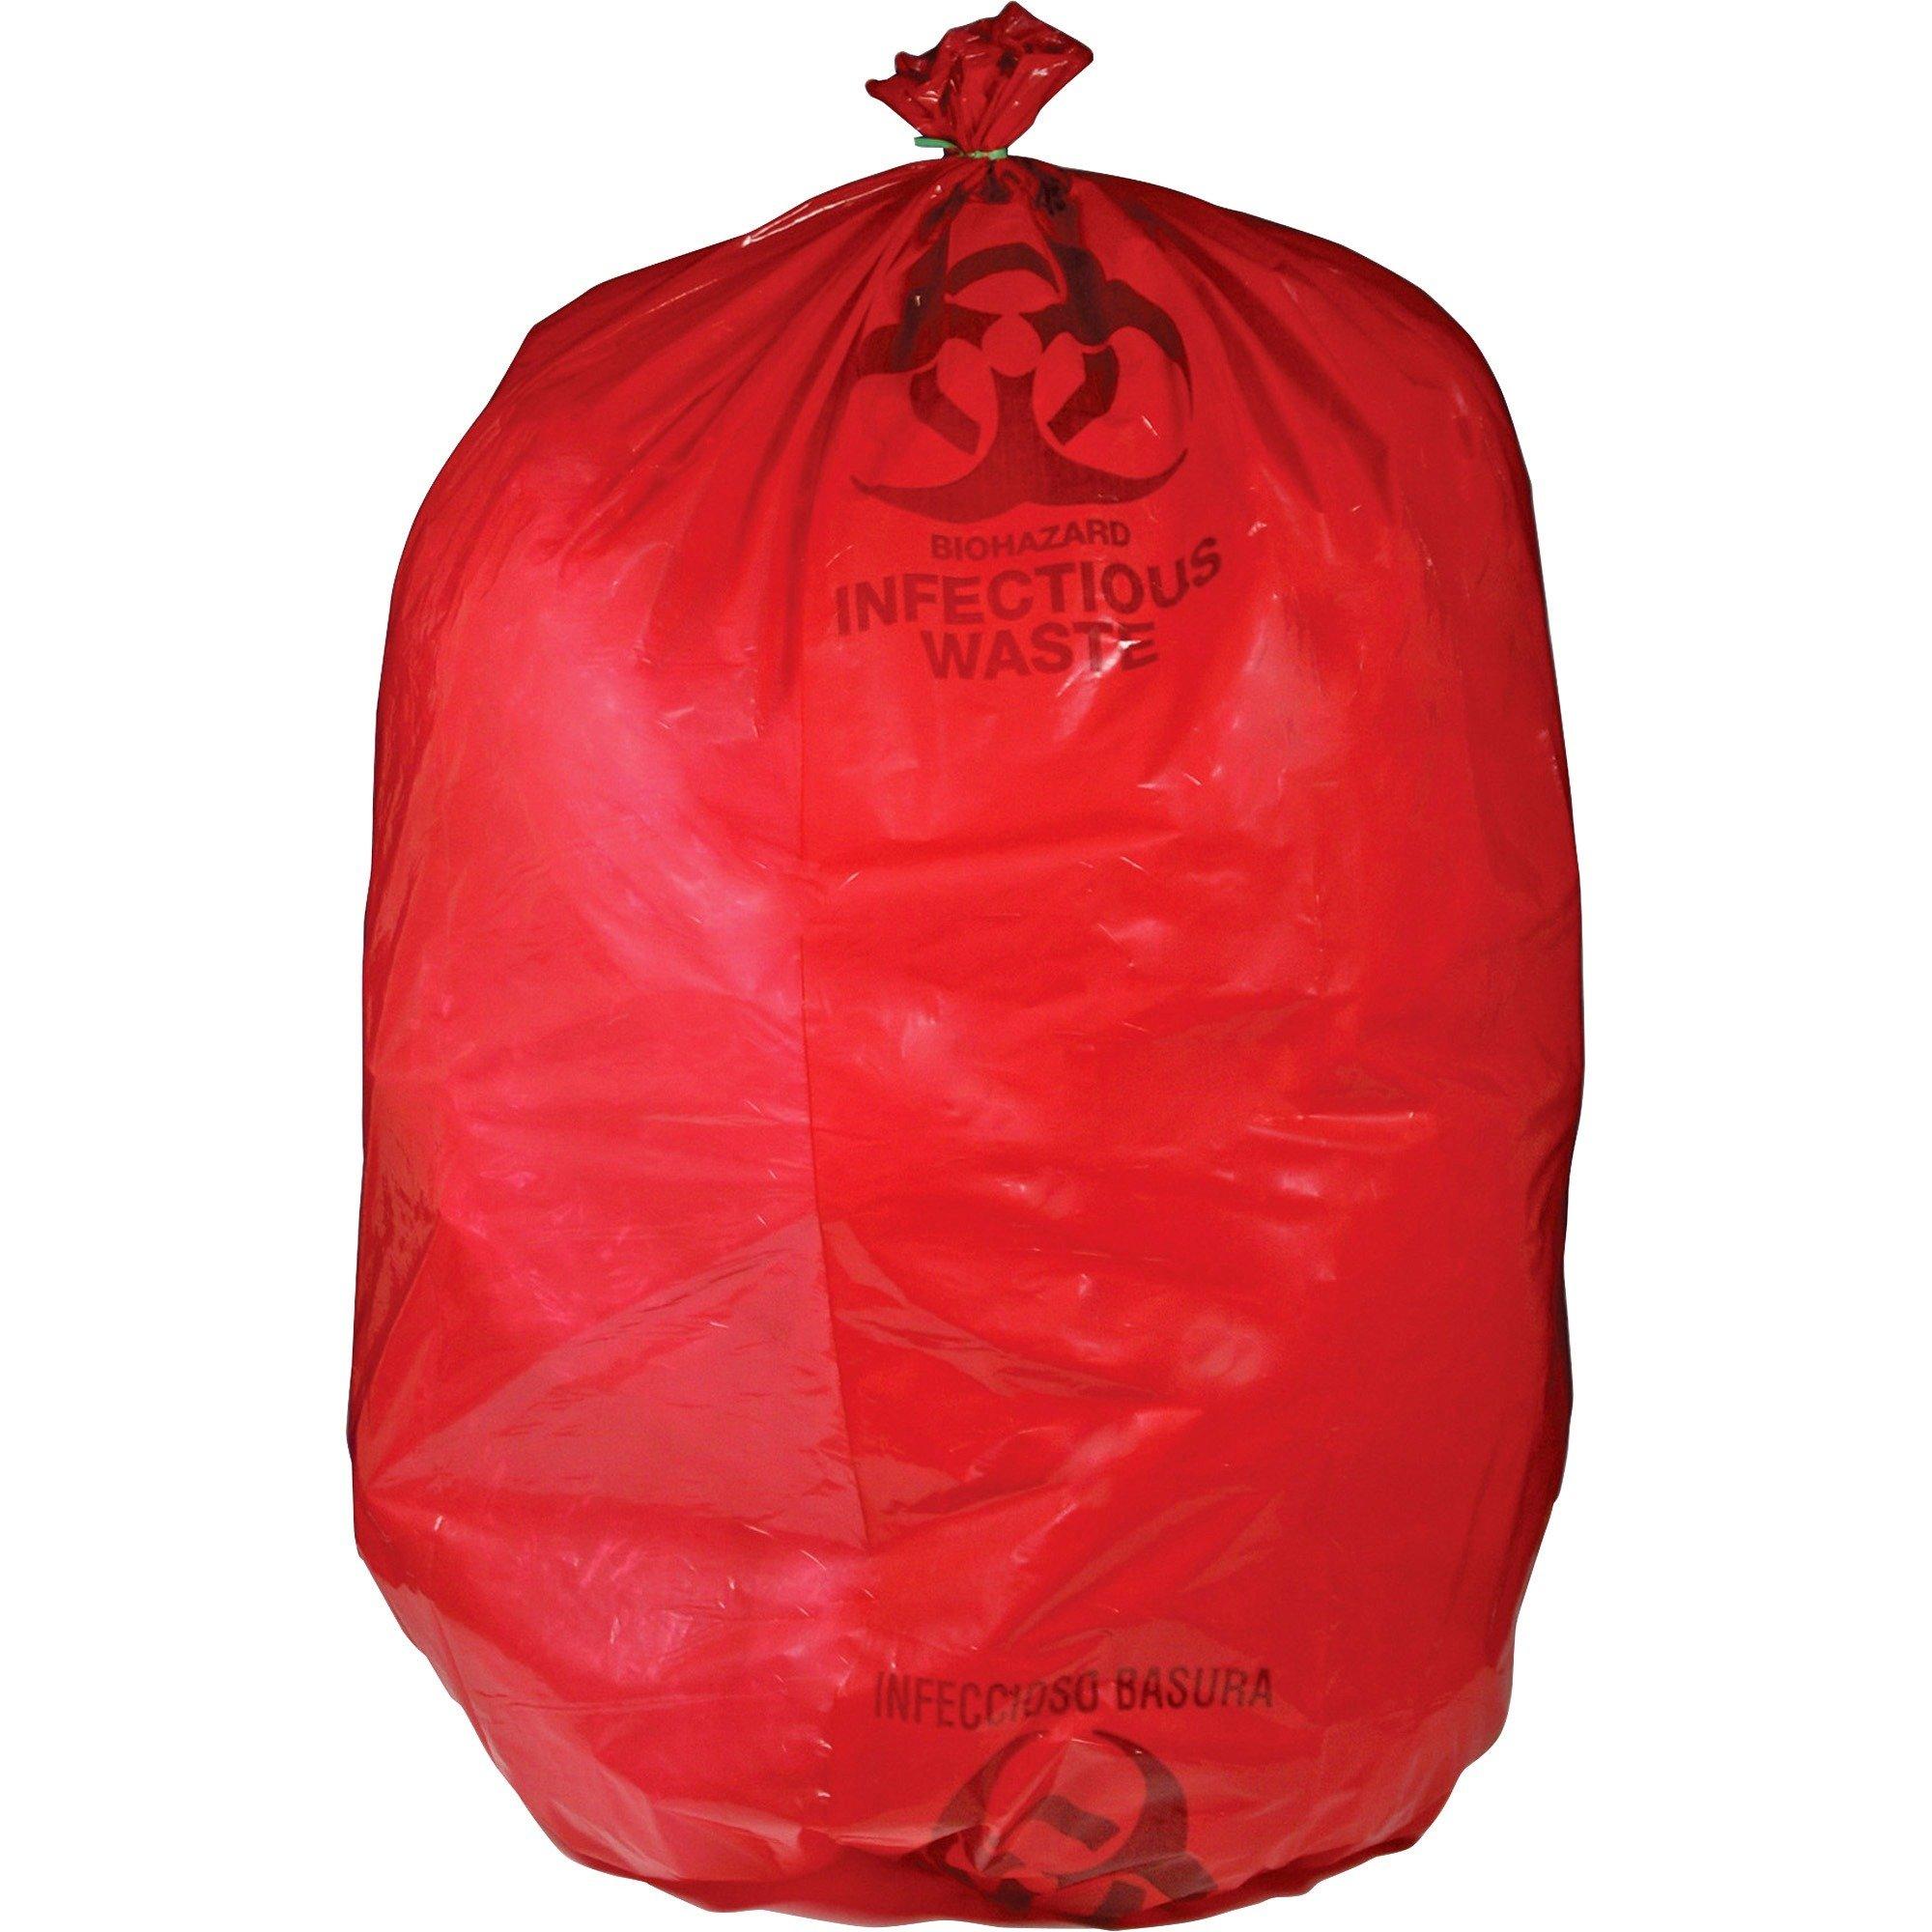 UMIRIWB142143 - Biohazard Waste Bag, 30-33 Gallon, 50/BX, Red